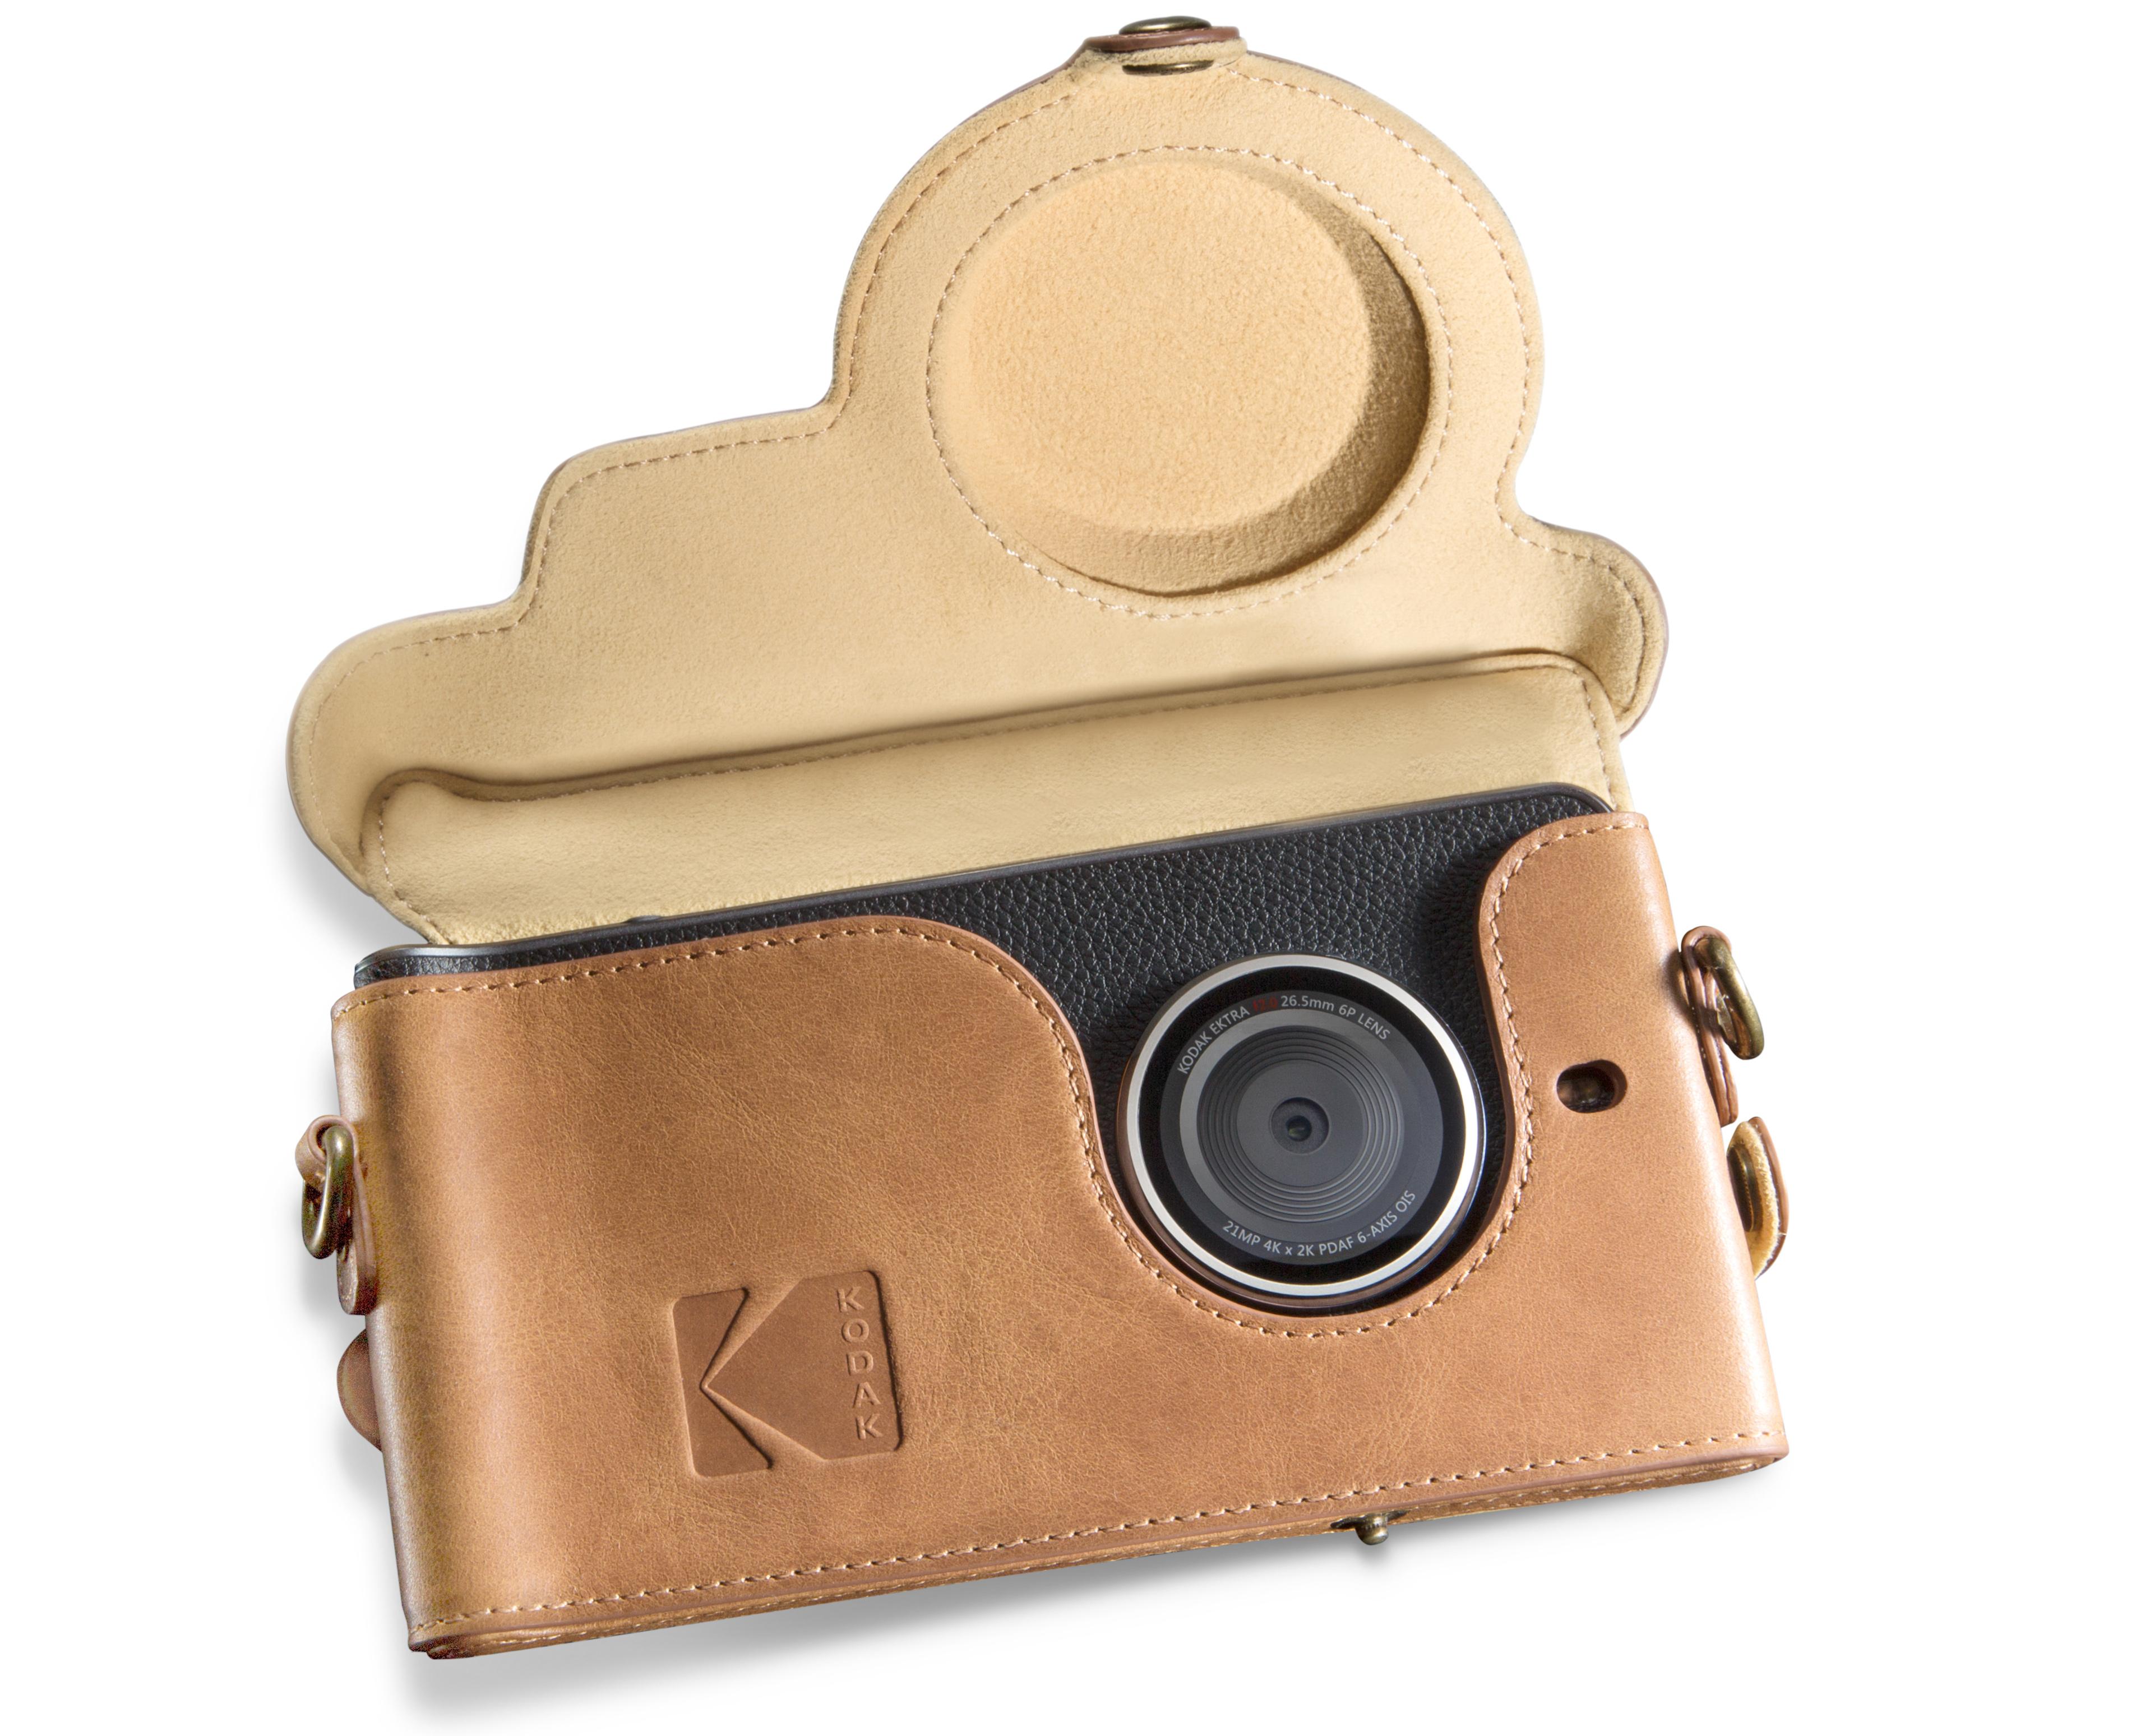 Kodak Ektra Smartphone Announced Mediatek Helio X20 21